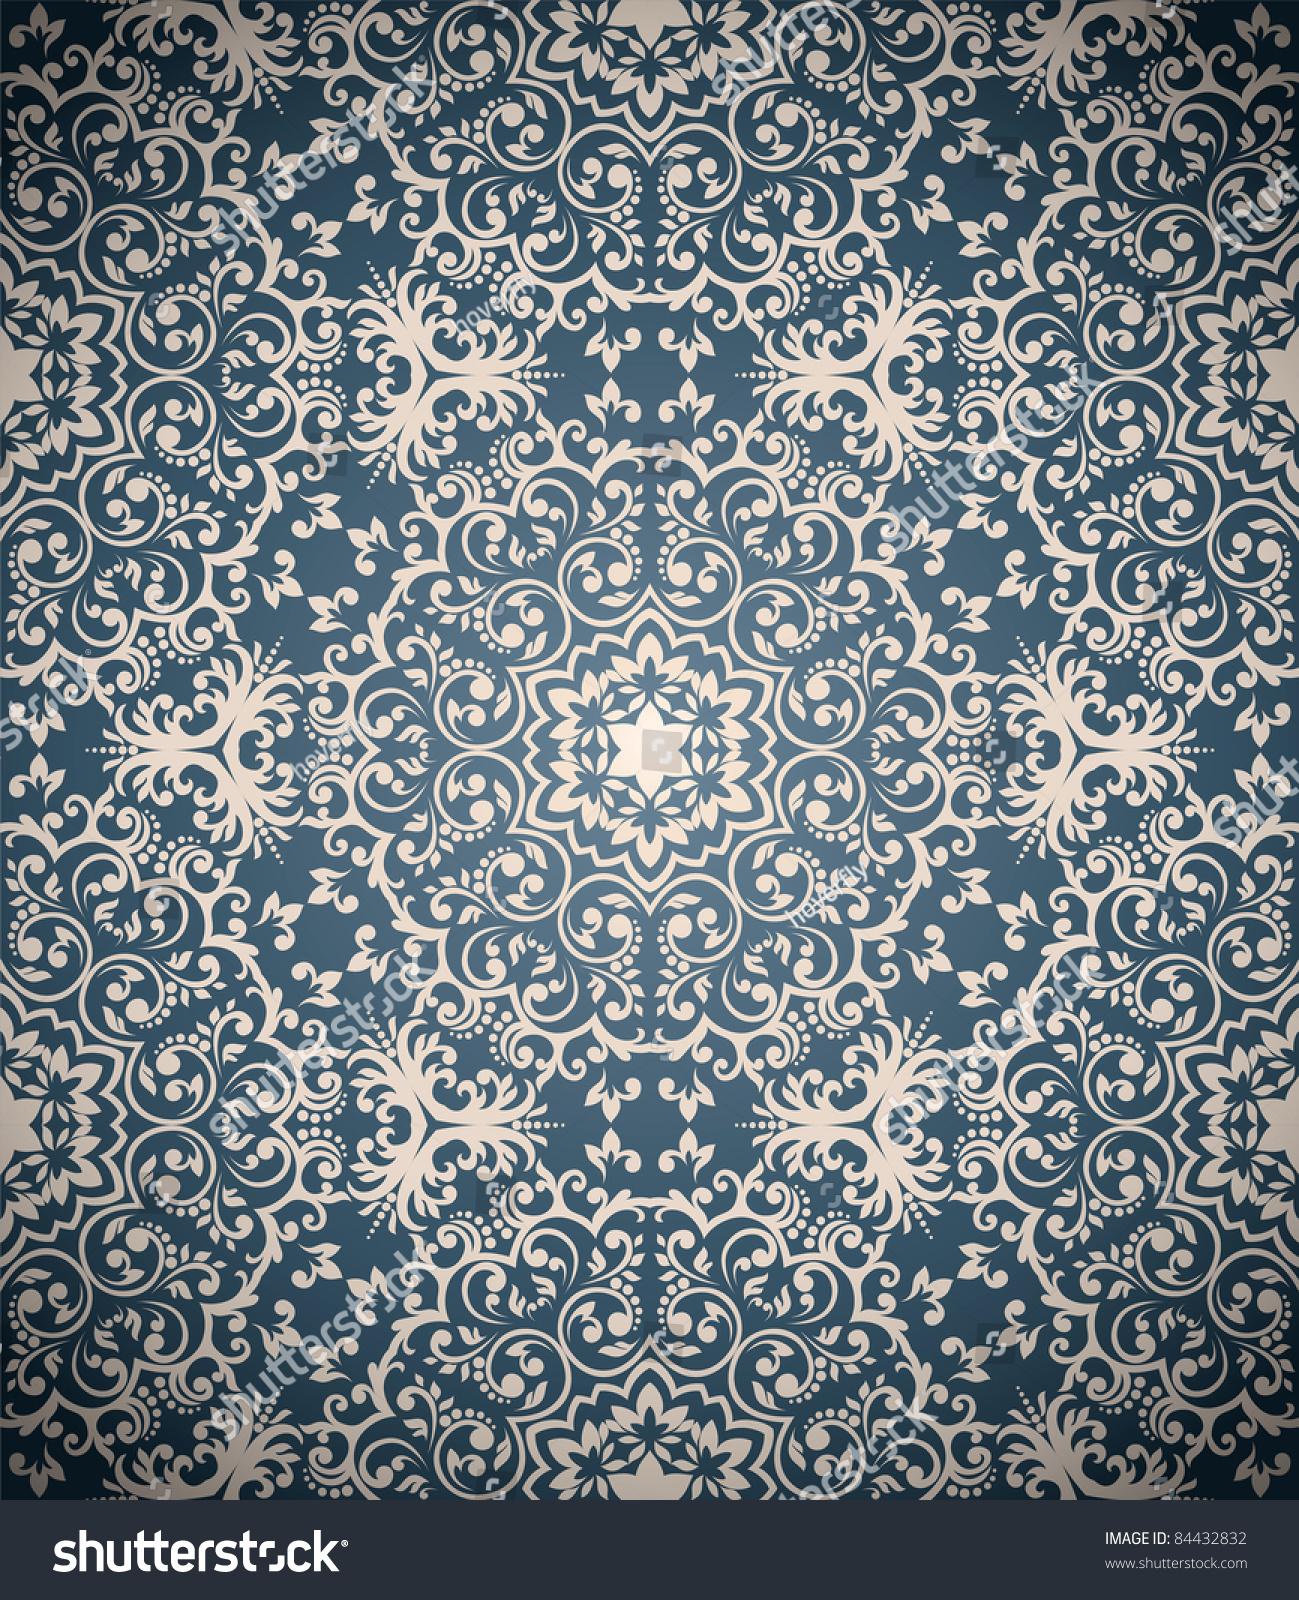 Abstract Seamless Wallpaper Stock Photo 84432832